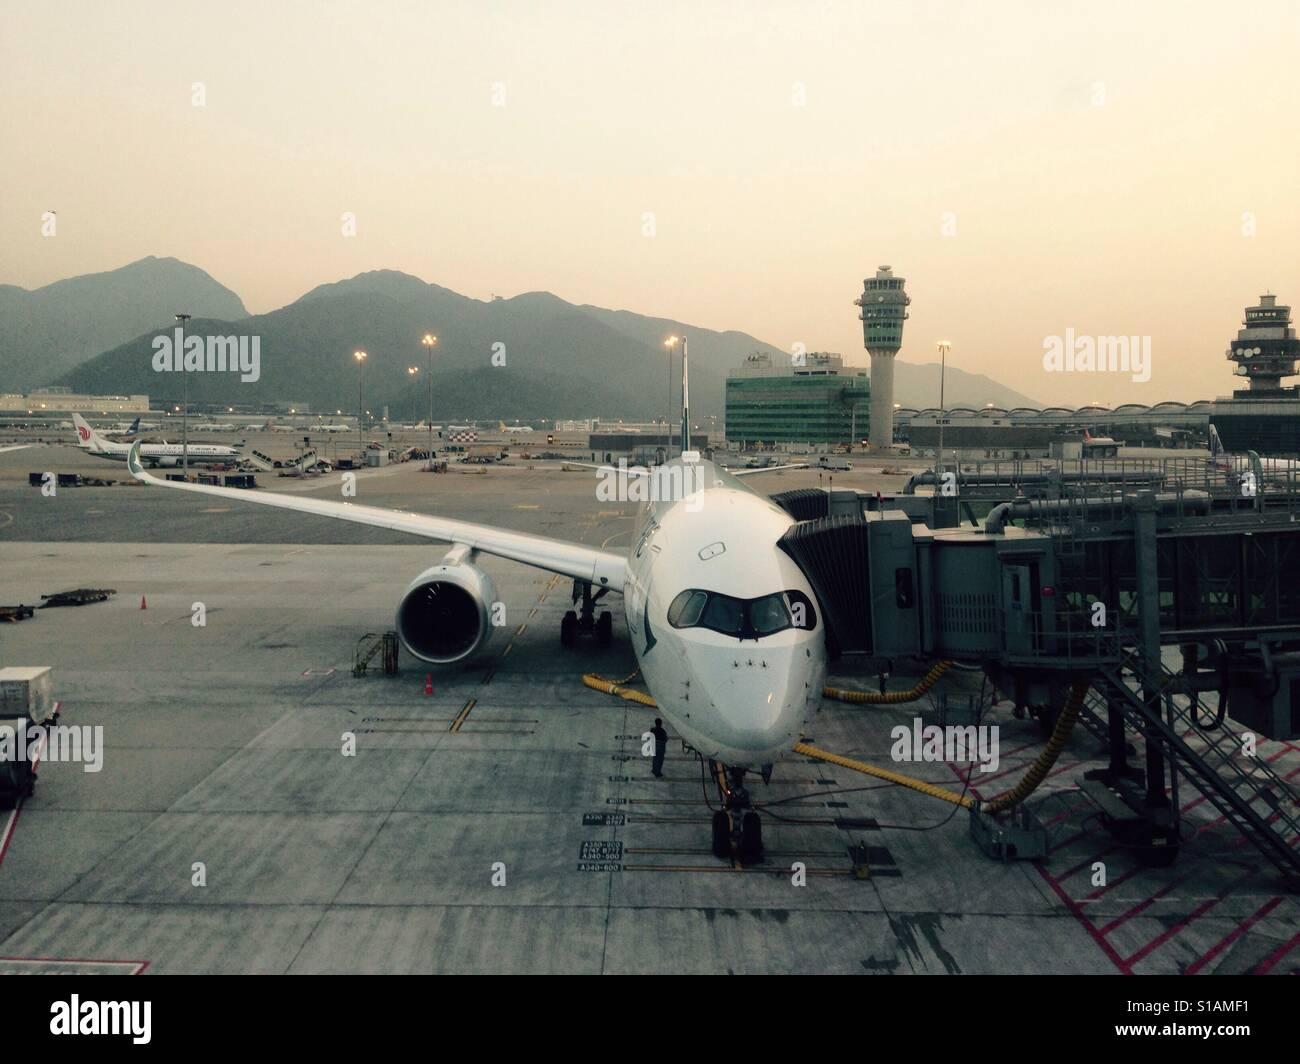 Cathay Pacific A350 on stand at Hong Kong airport - Stock Image